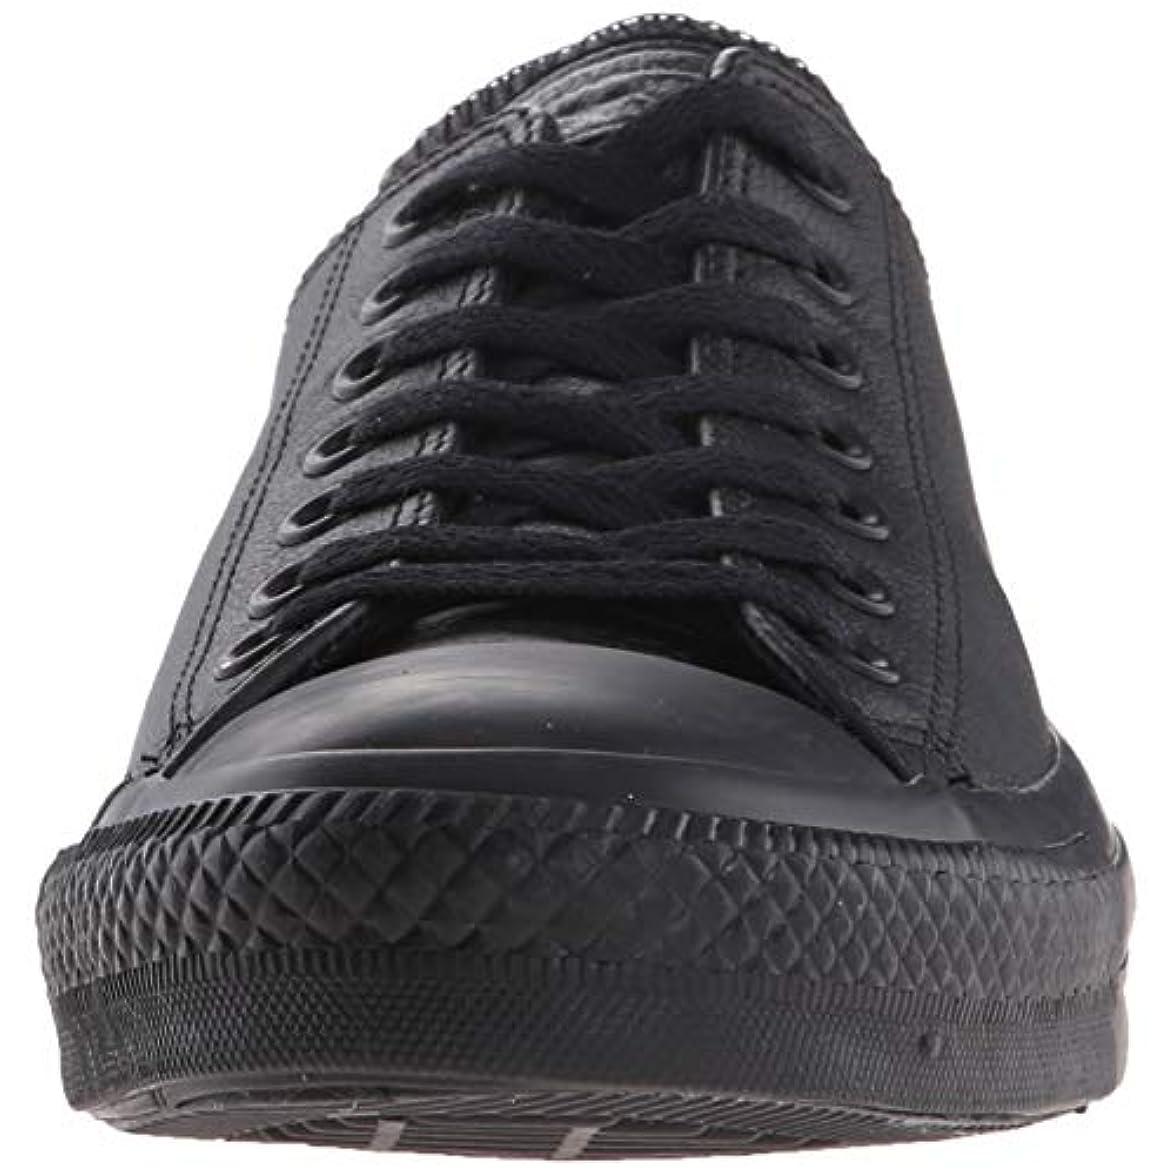 Converse - All Star Ox Sneaker Unisex Adulto